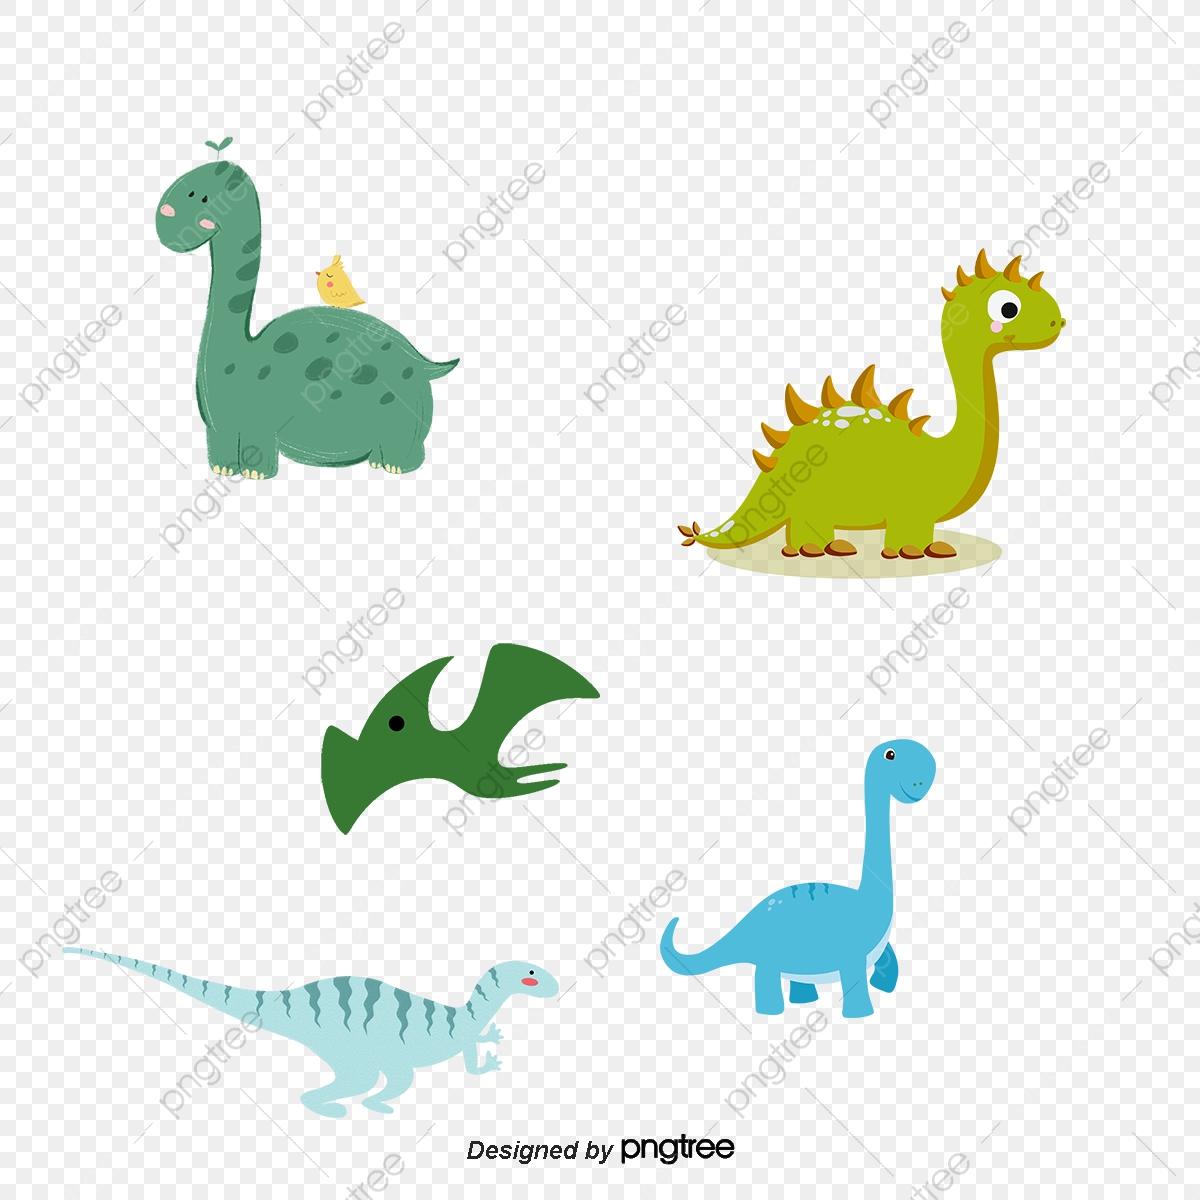 Anime Dinosaurs, Anime Vector, Dinosaur Silhouette, Dinosaur PNG and.